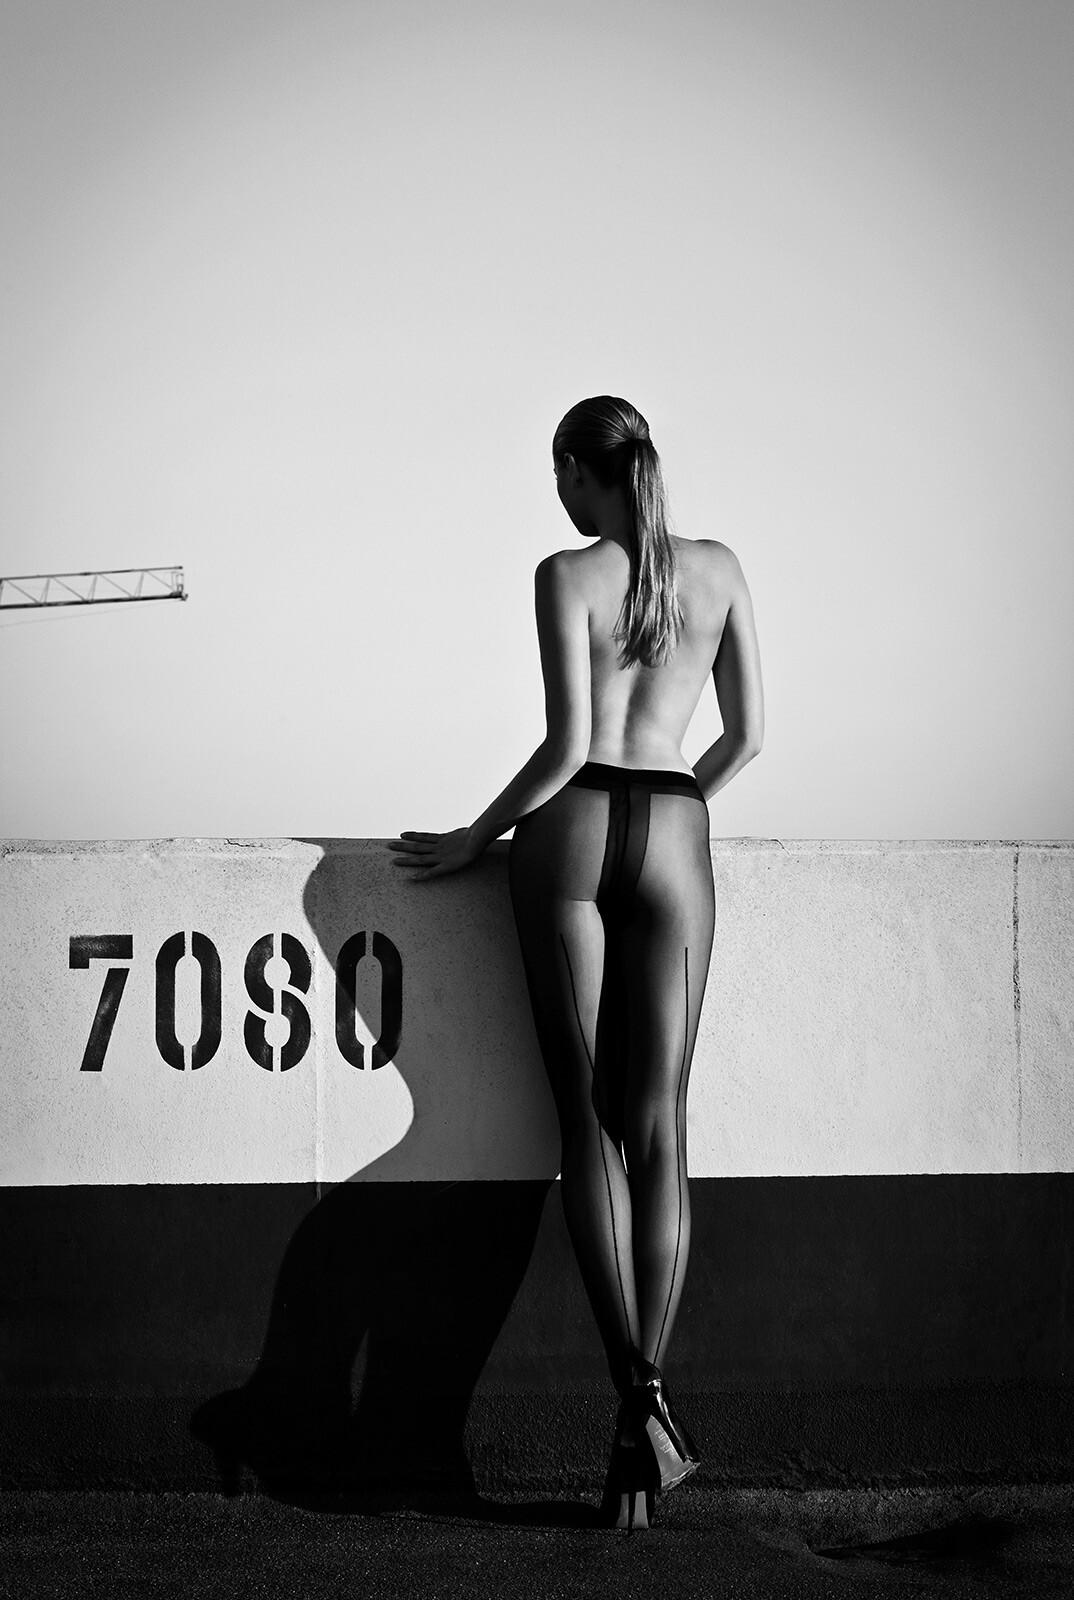 7080 - Manuel Pandalis